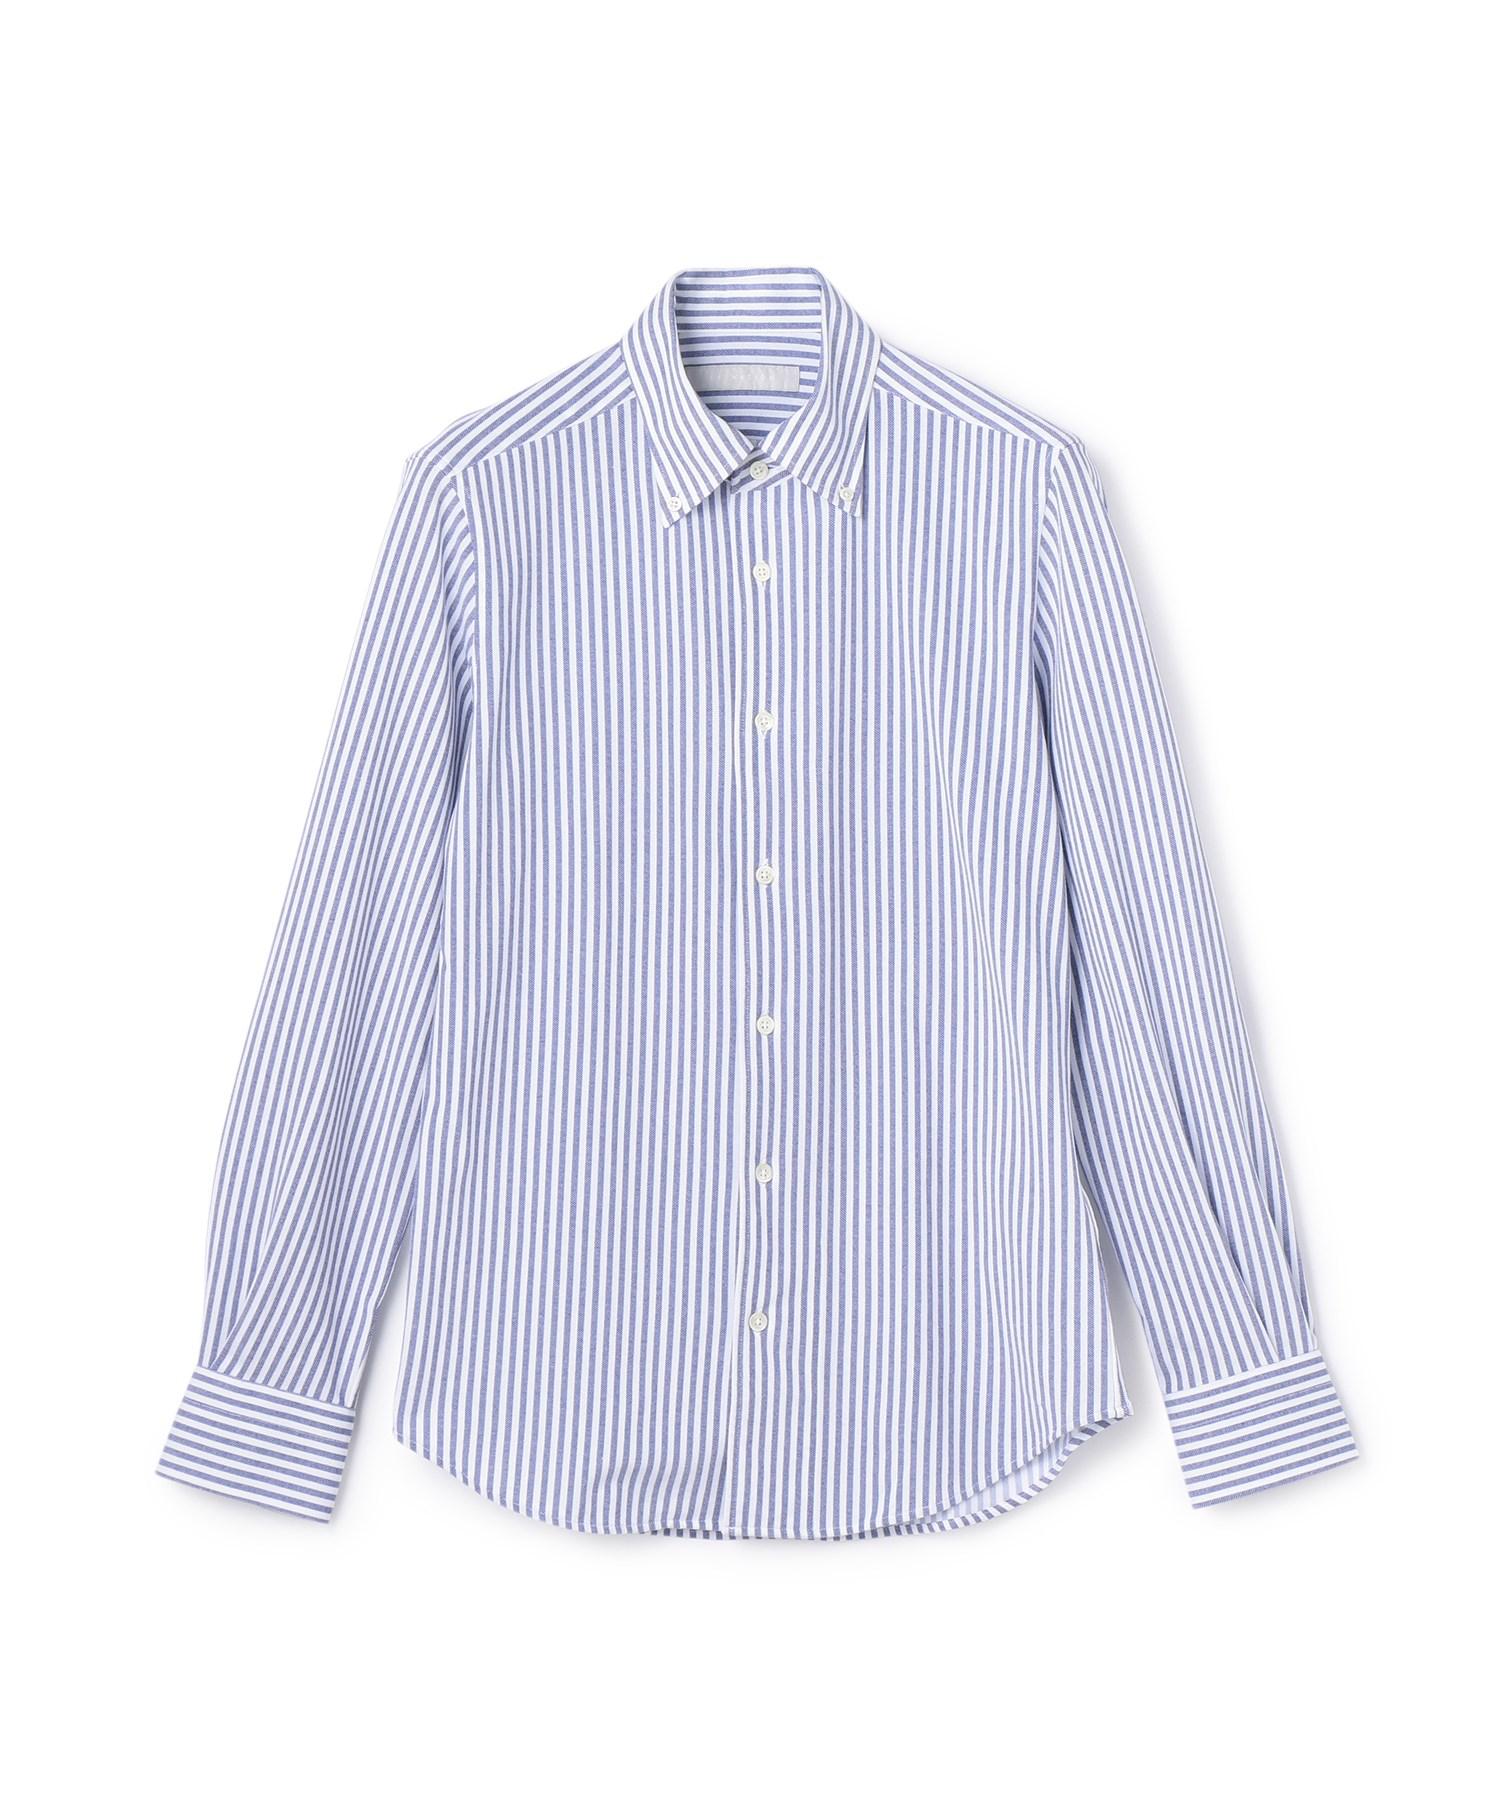 ESTNATION / ロングスリーブカノコシャツ<THE FUNCTIONAL WEAR >